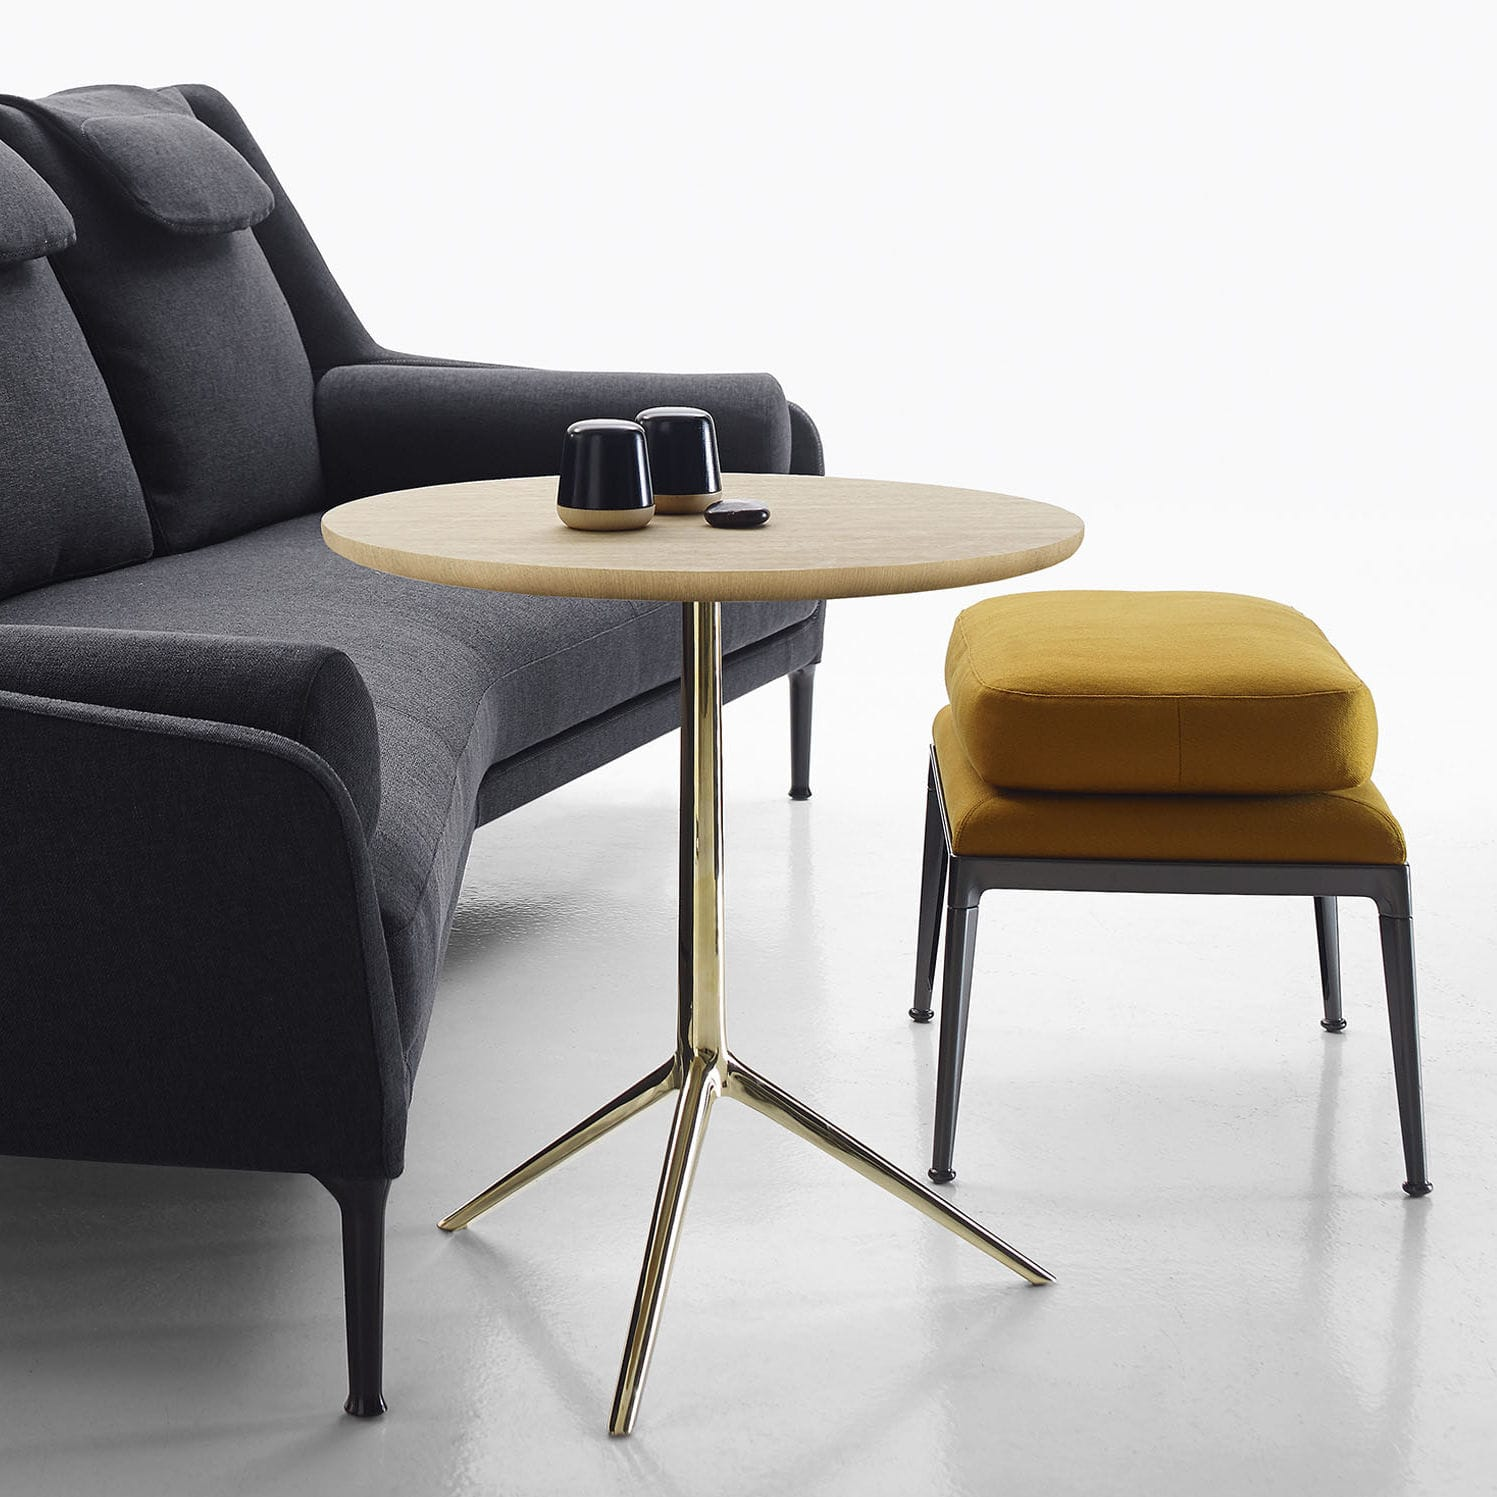 Contemporary Pedestal Table / Glass / Wood Veneer / Brass   COZY